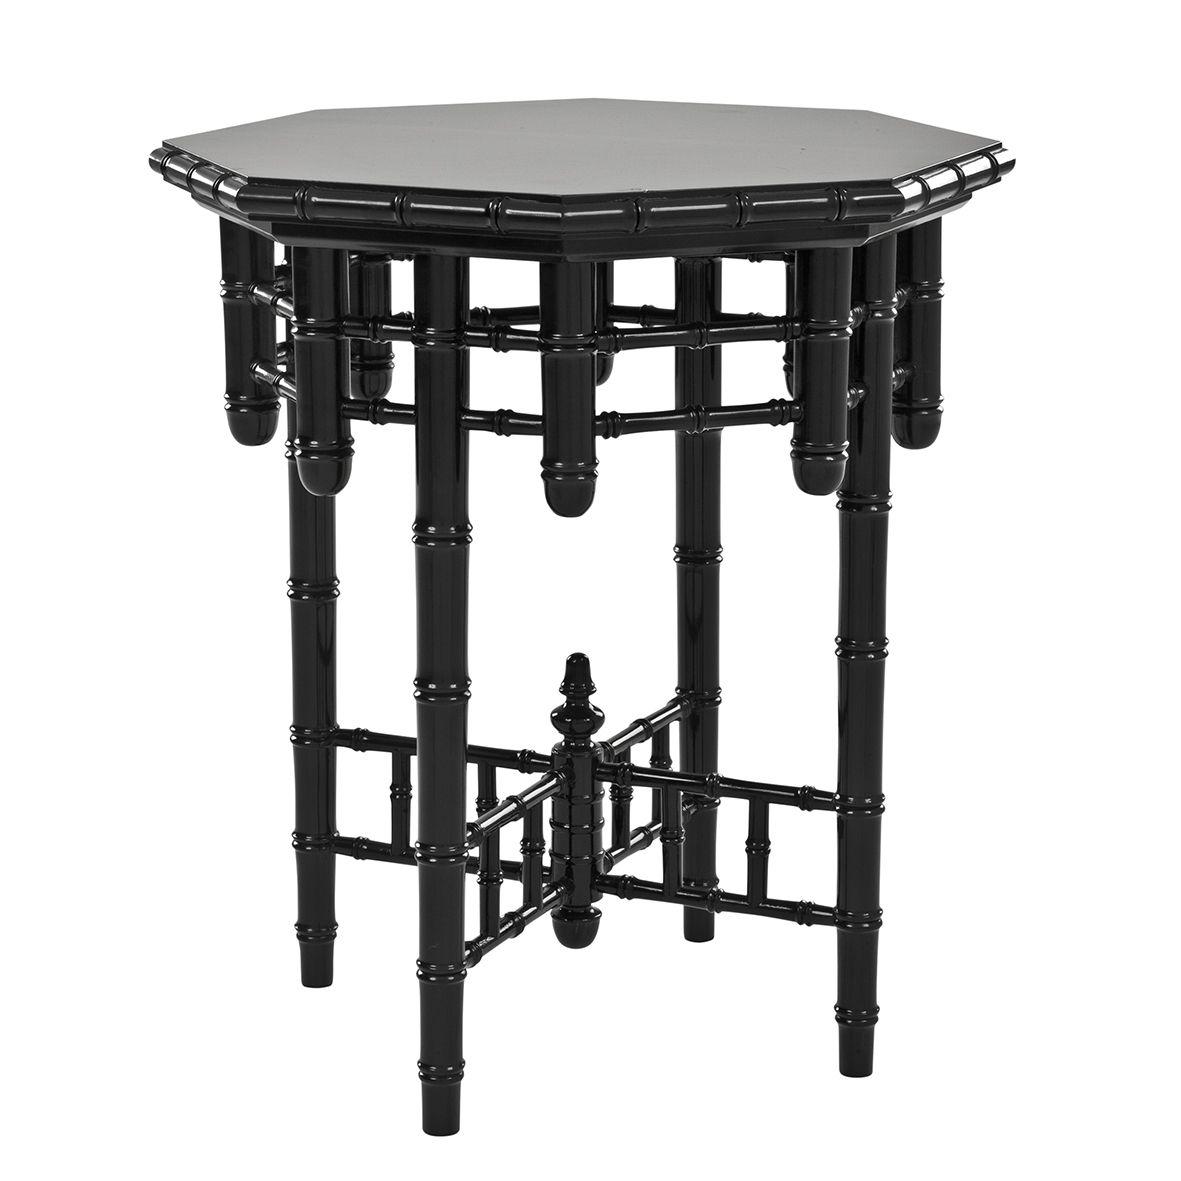 Приставной стол Eichholtz Side Table Octagonal  - фото 1